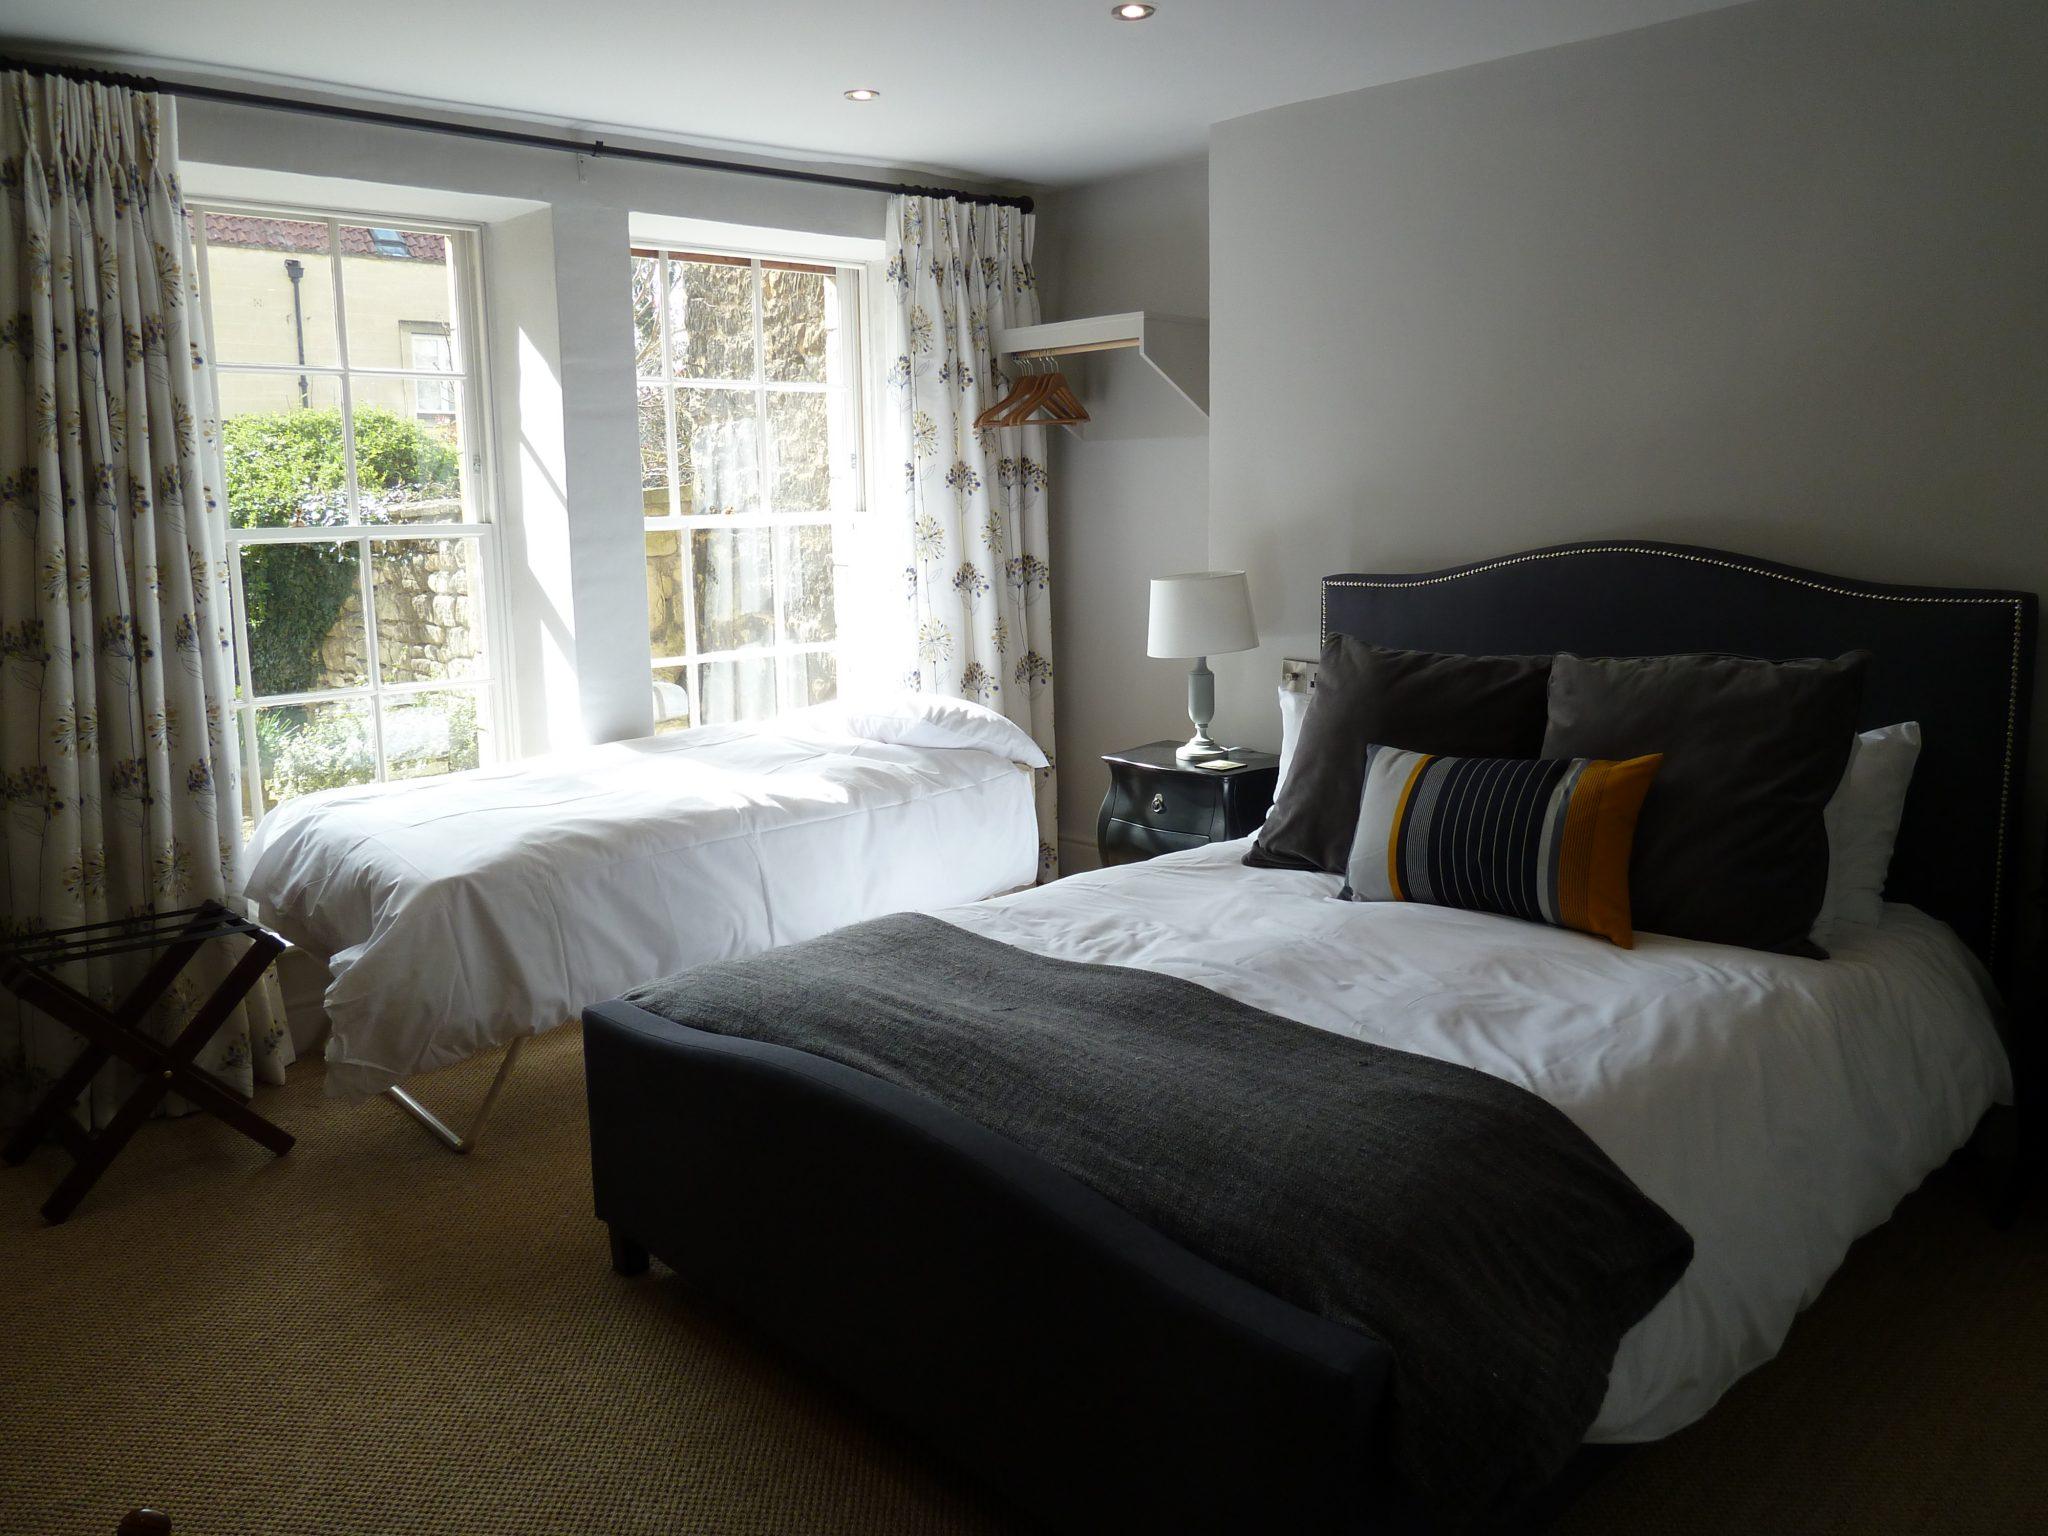 A Triple room at the Edgar Townhouse in Bath